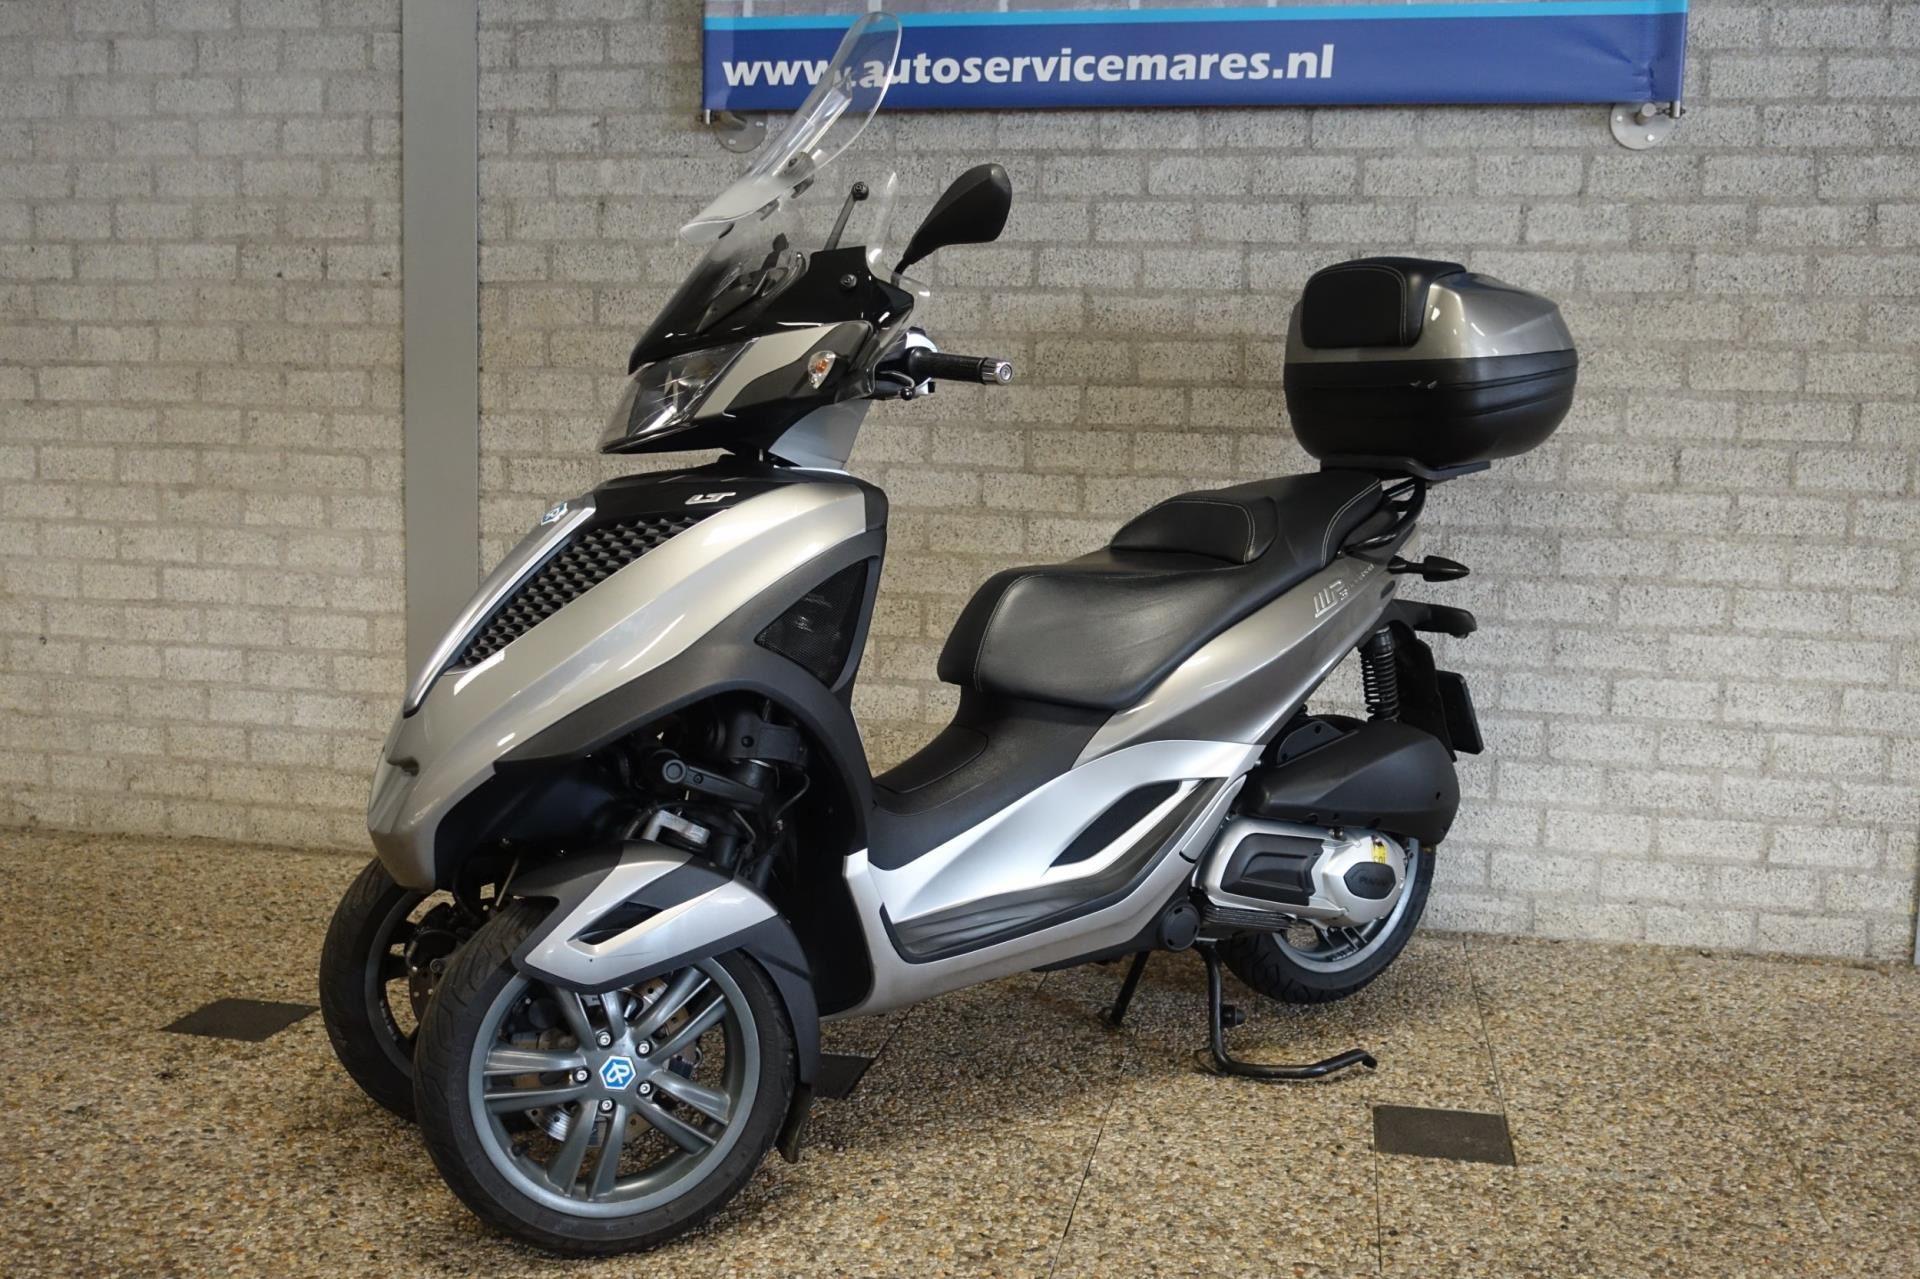 Piaggio Scooter occasion - Autoservice Mares